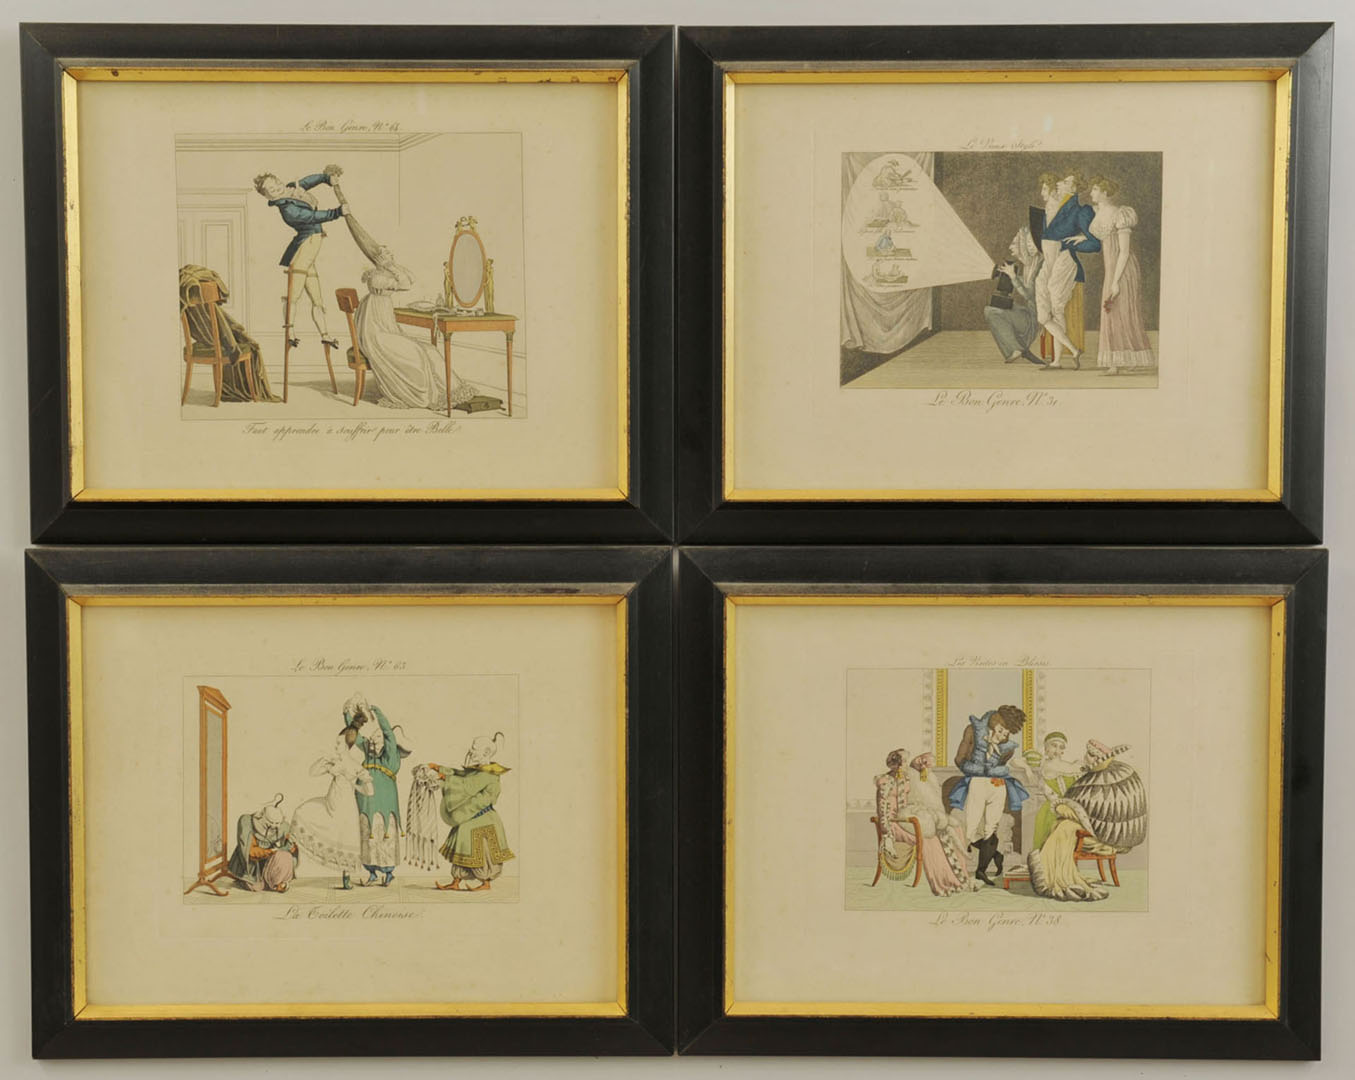 Lot 2872272: 4 French Colored Engravings, Le Bon Genre